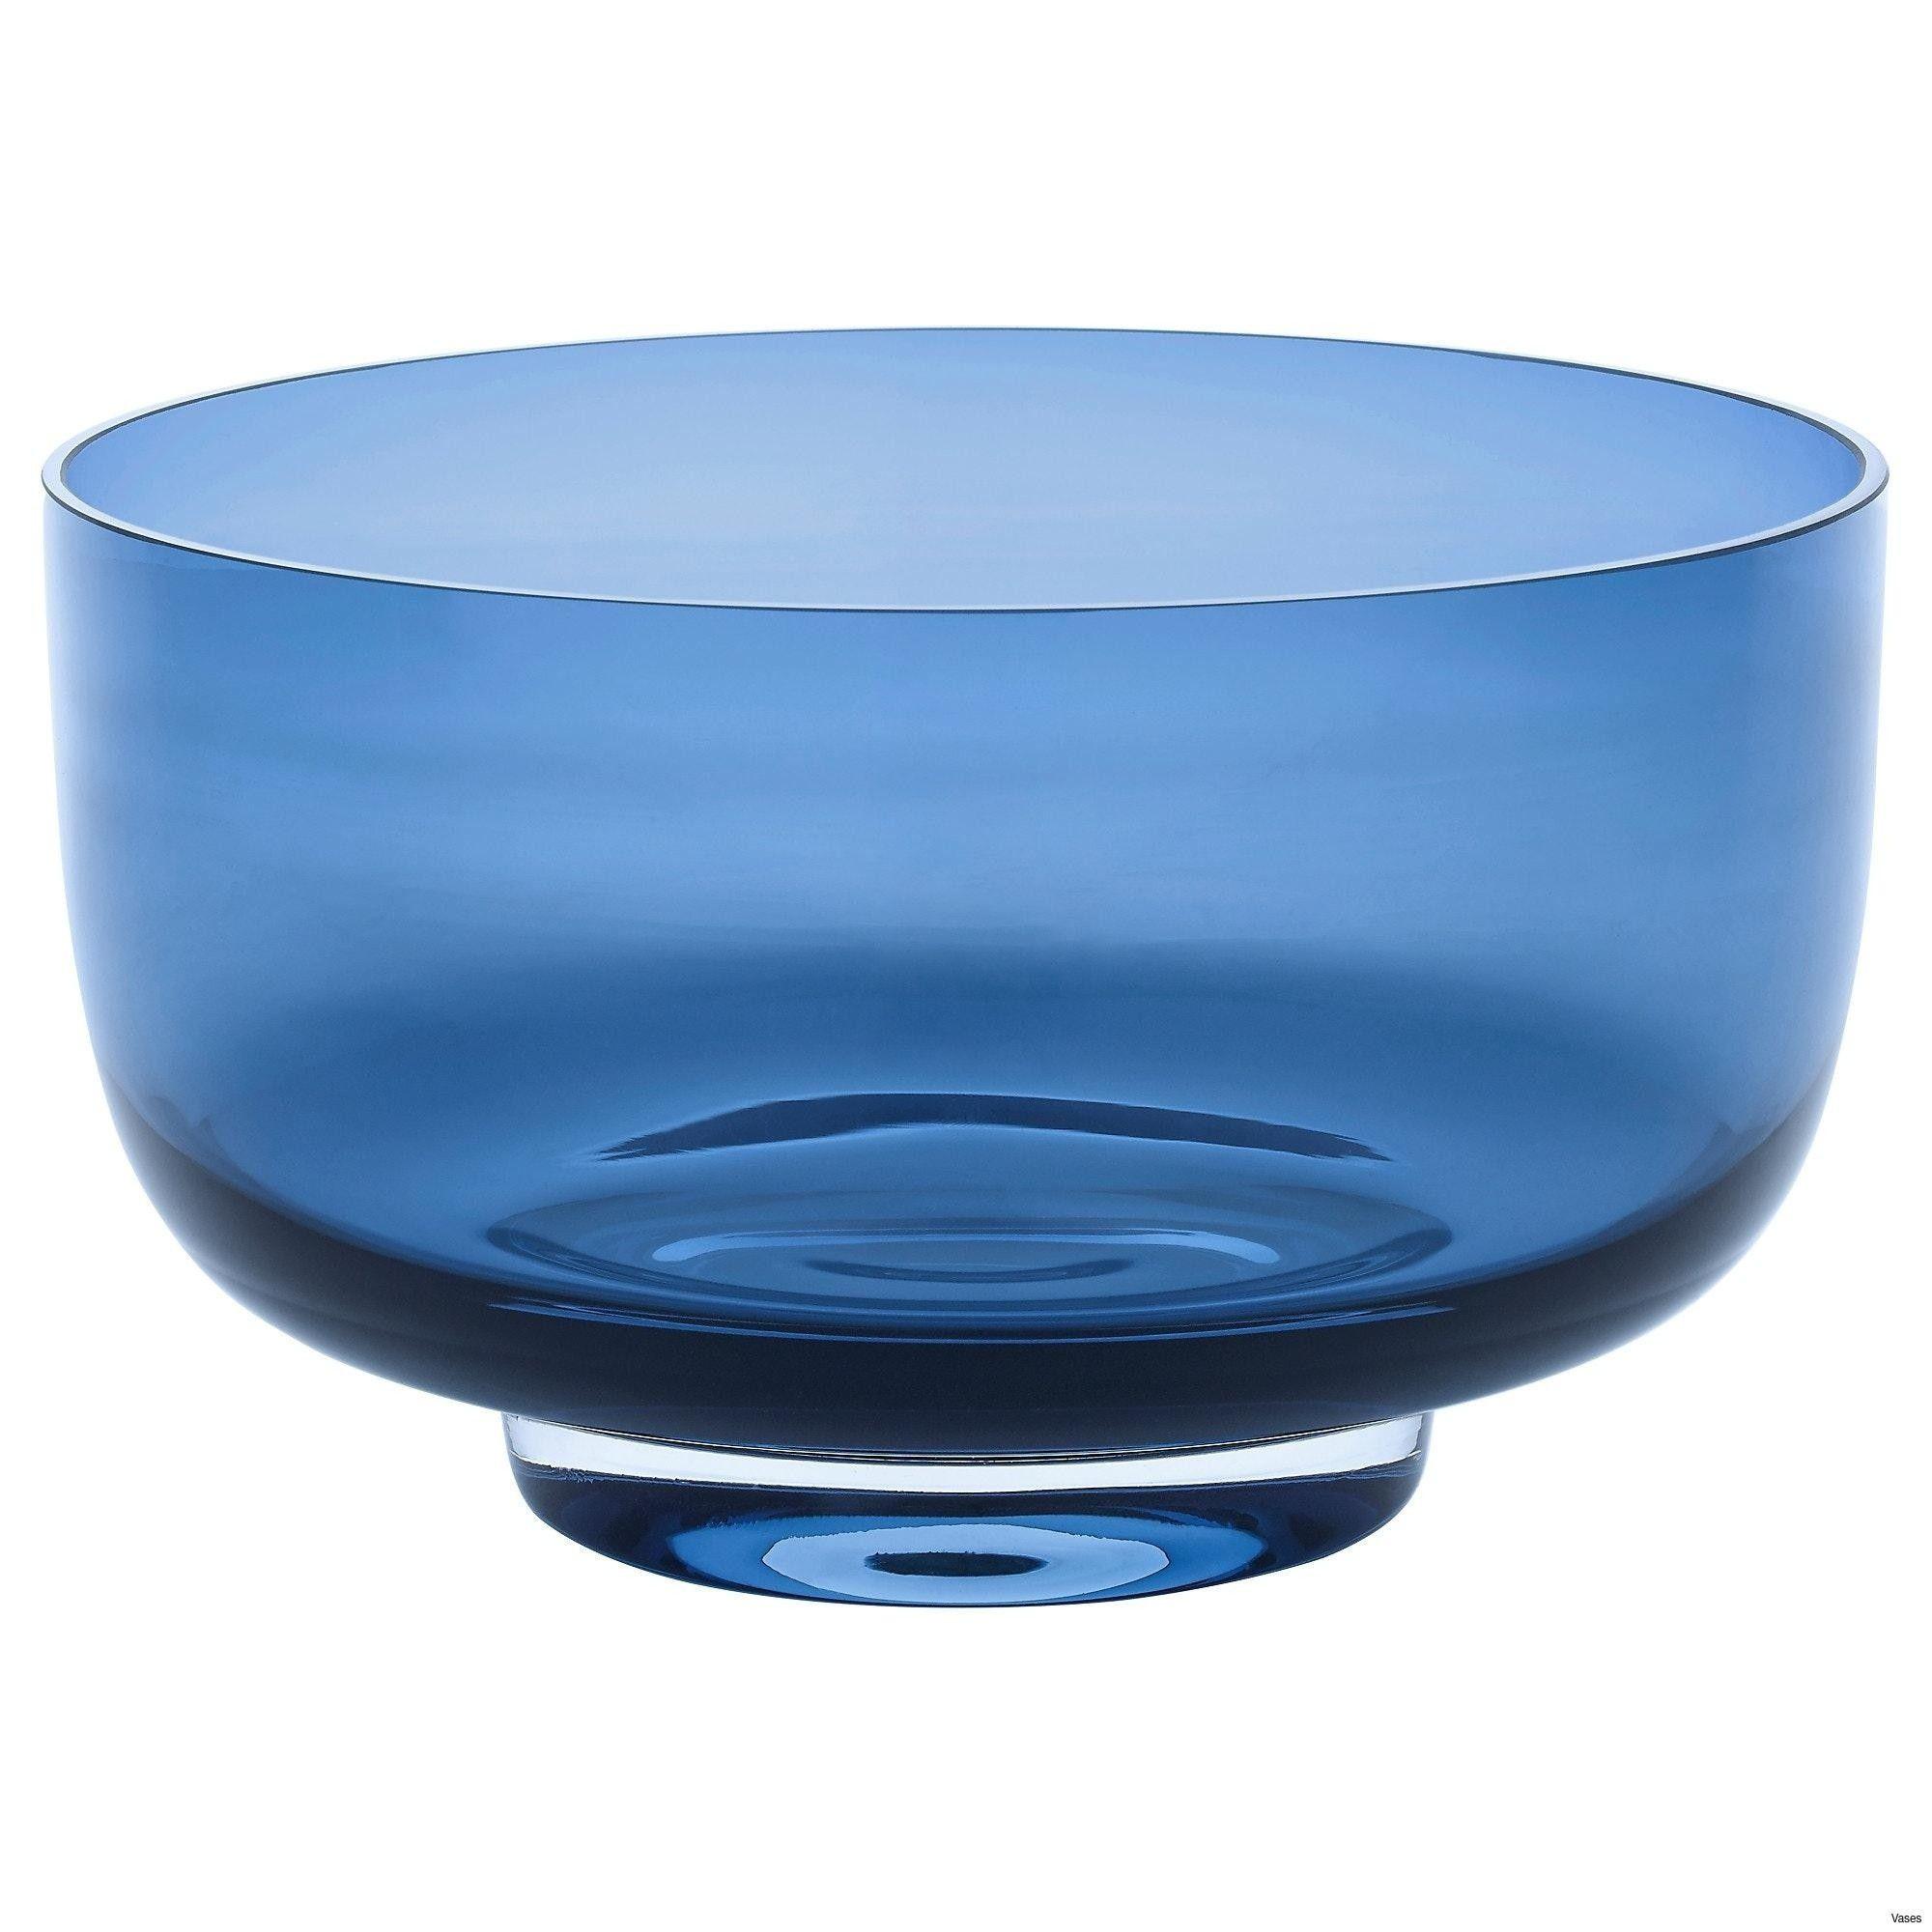 blue square vase of large white ceramic vase awesome white floor vase ceramic modern 40 for large white ceramic vase awesome white floor vase ceramic modern 40 inchl home design ikea inch